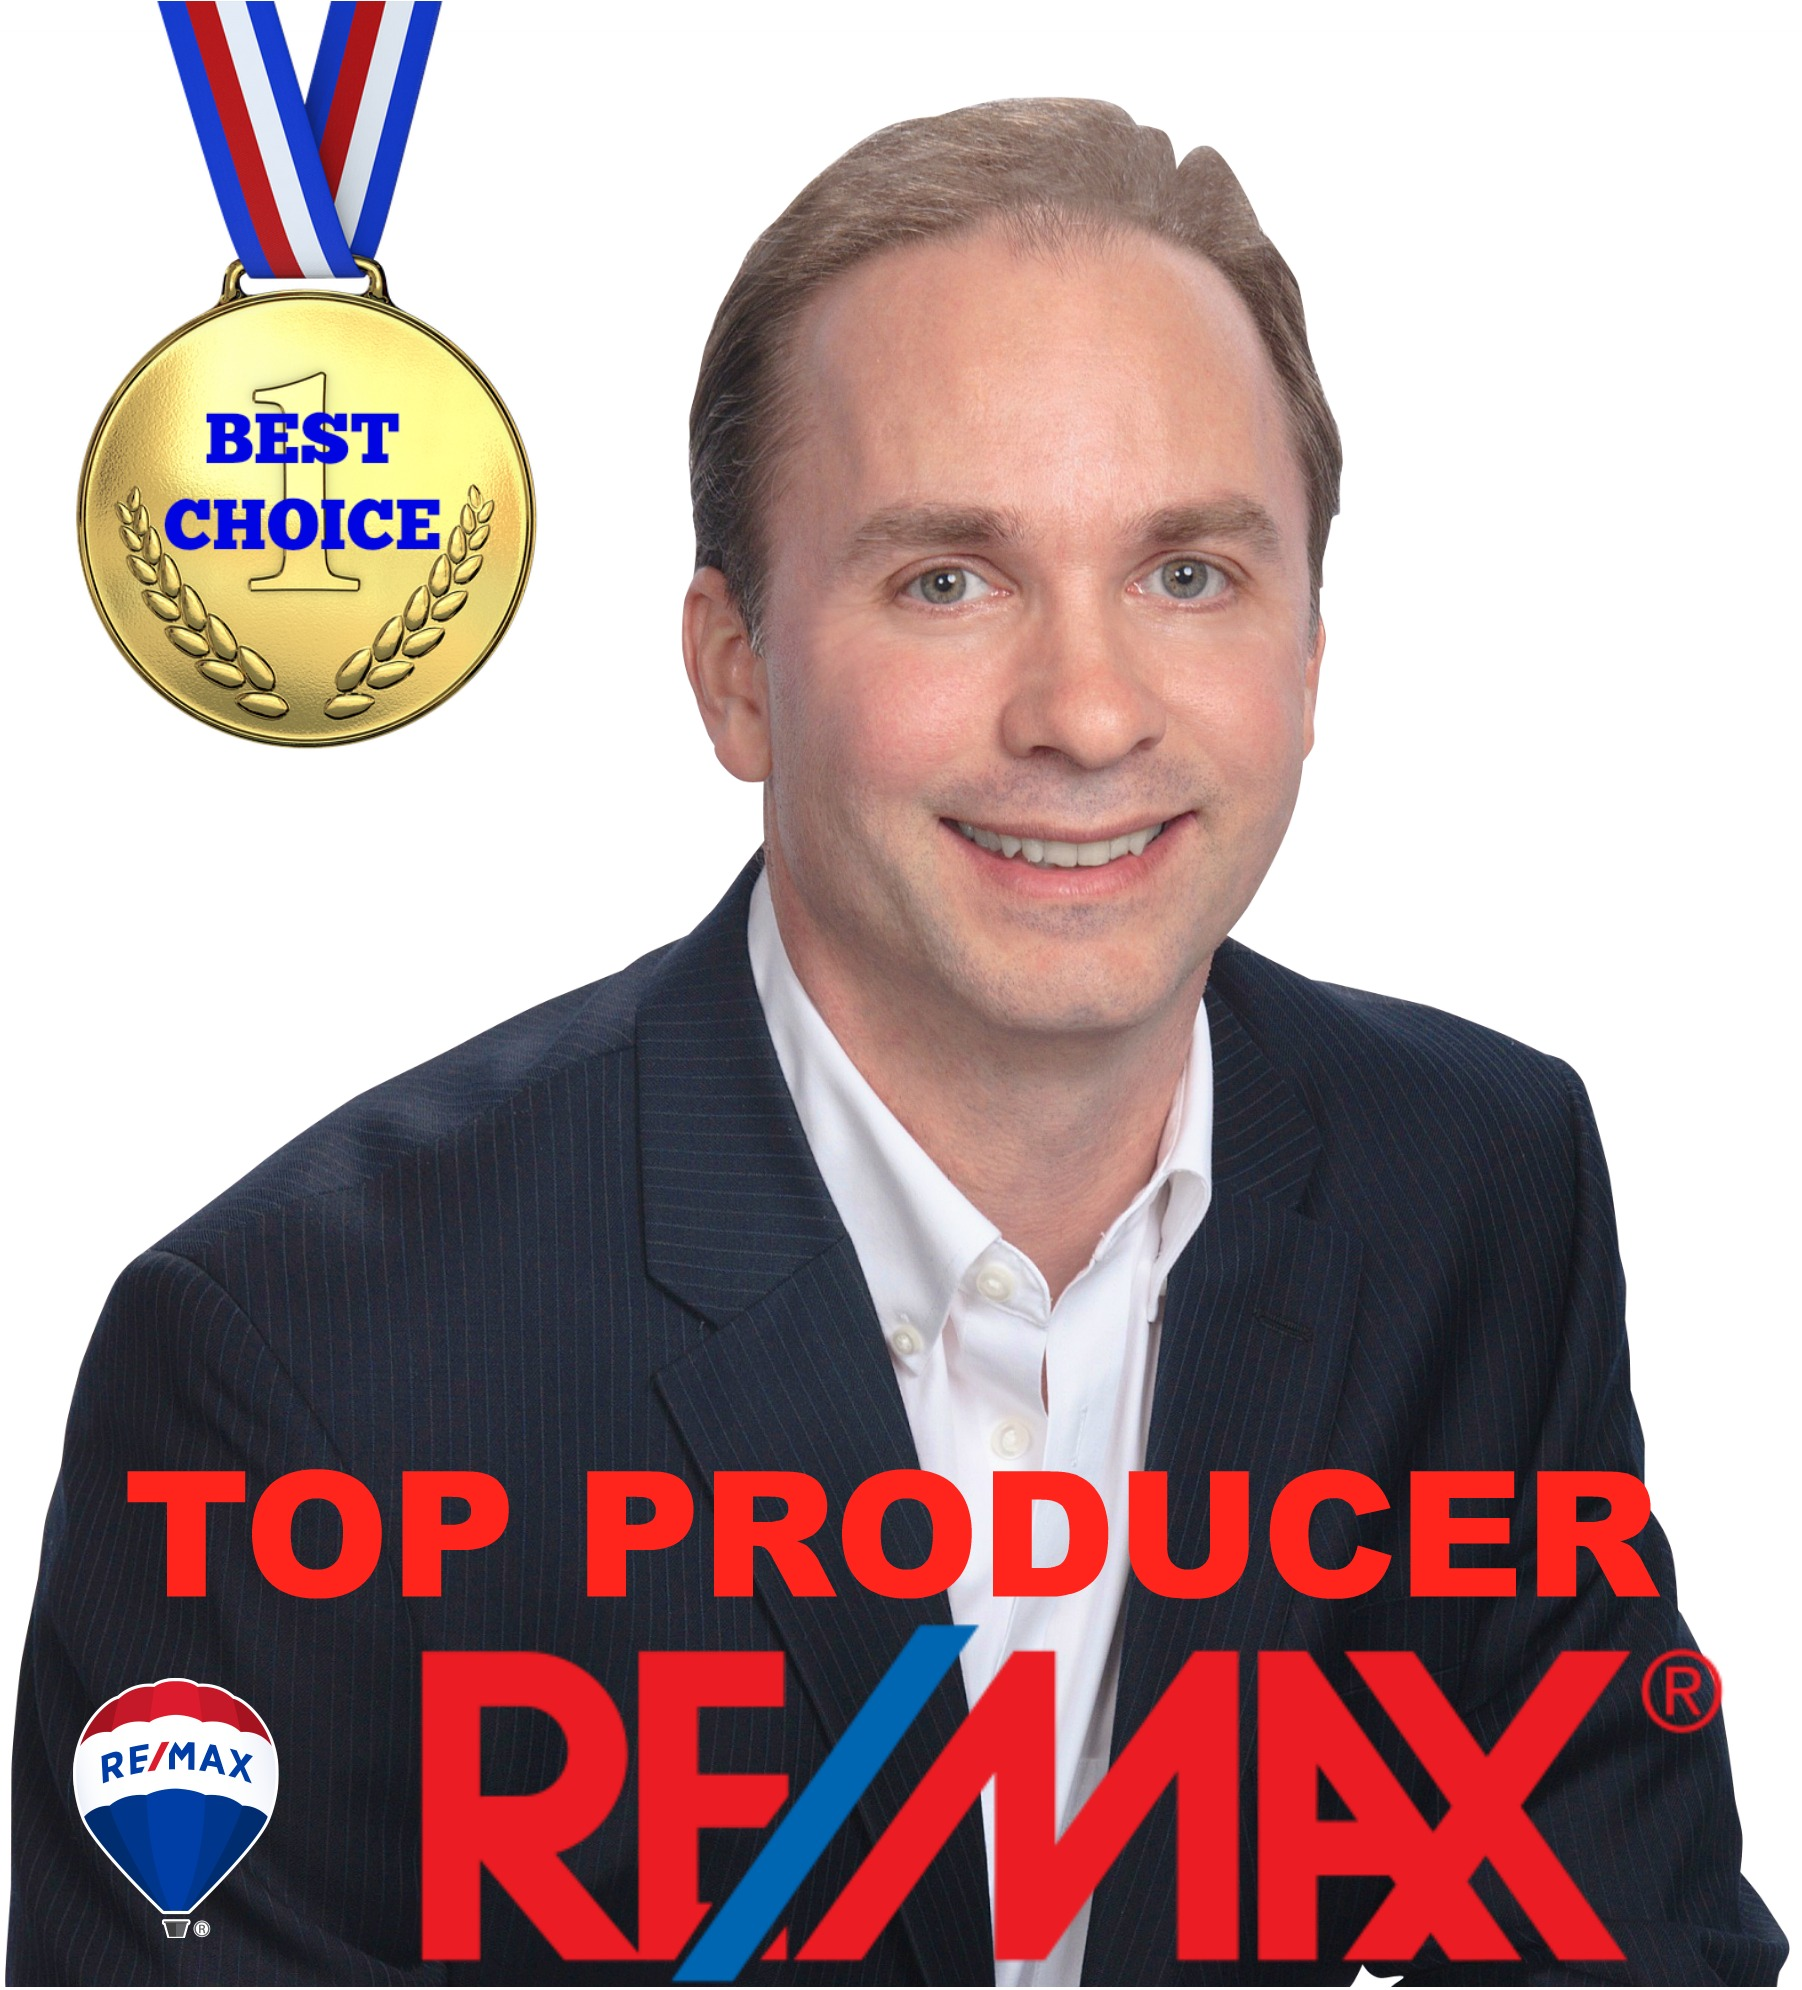 Jeff Grant Team REMAX Real Estate Agent